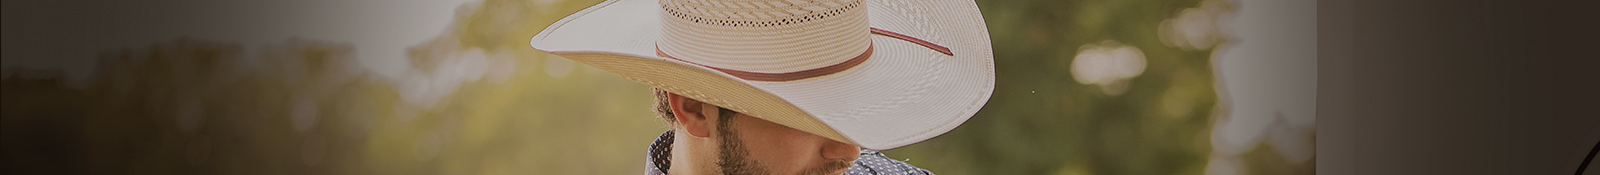 Men's Western Hats